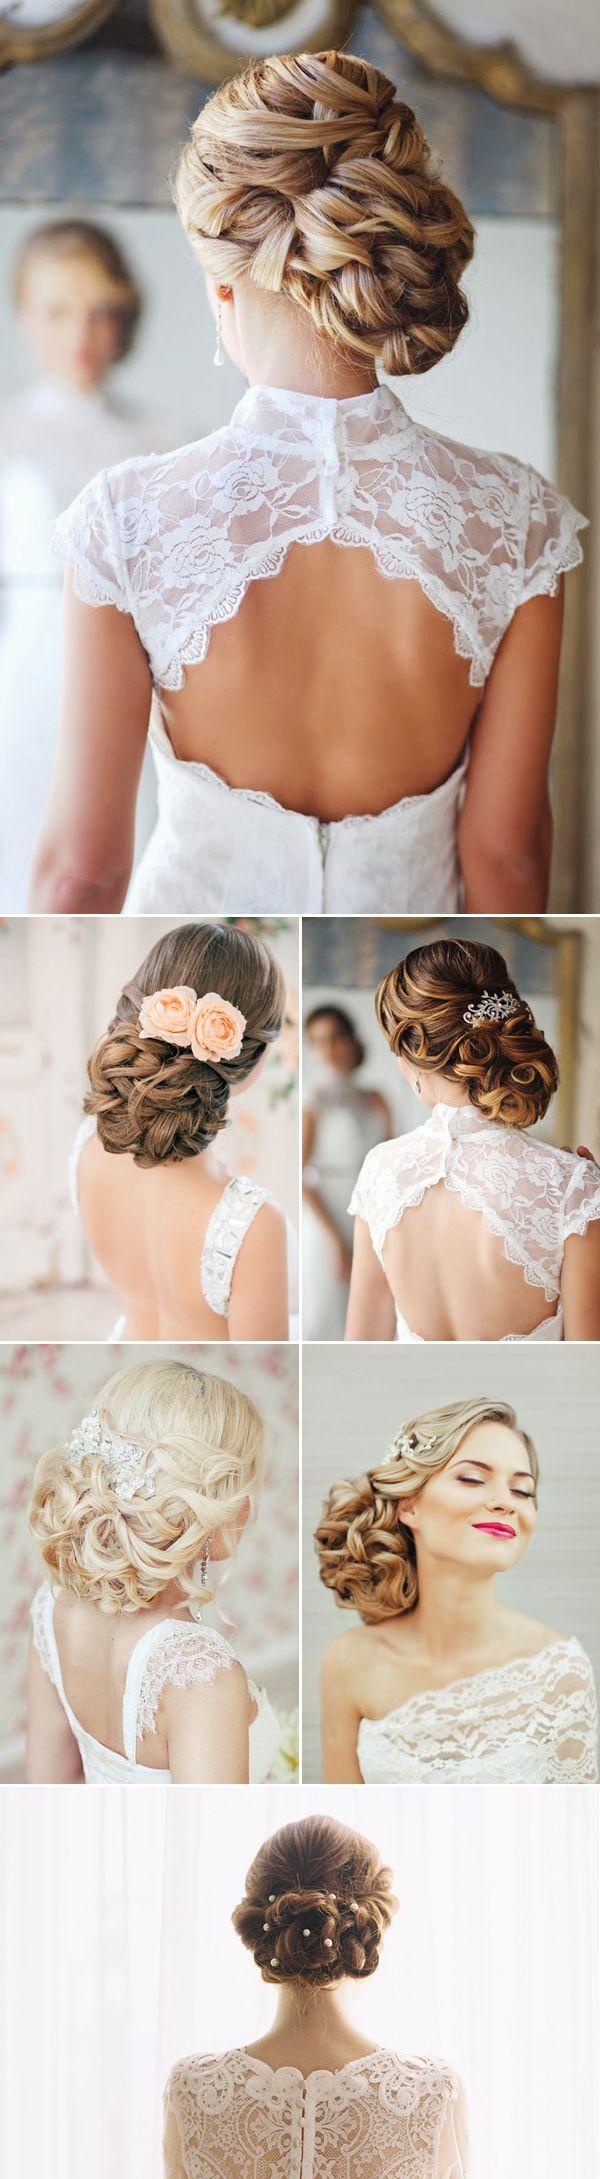 Bridal hair as romantic as your love.